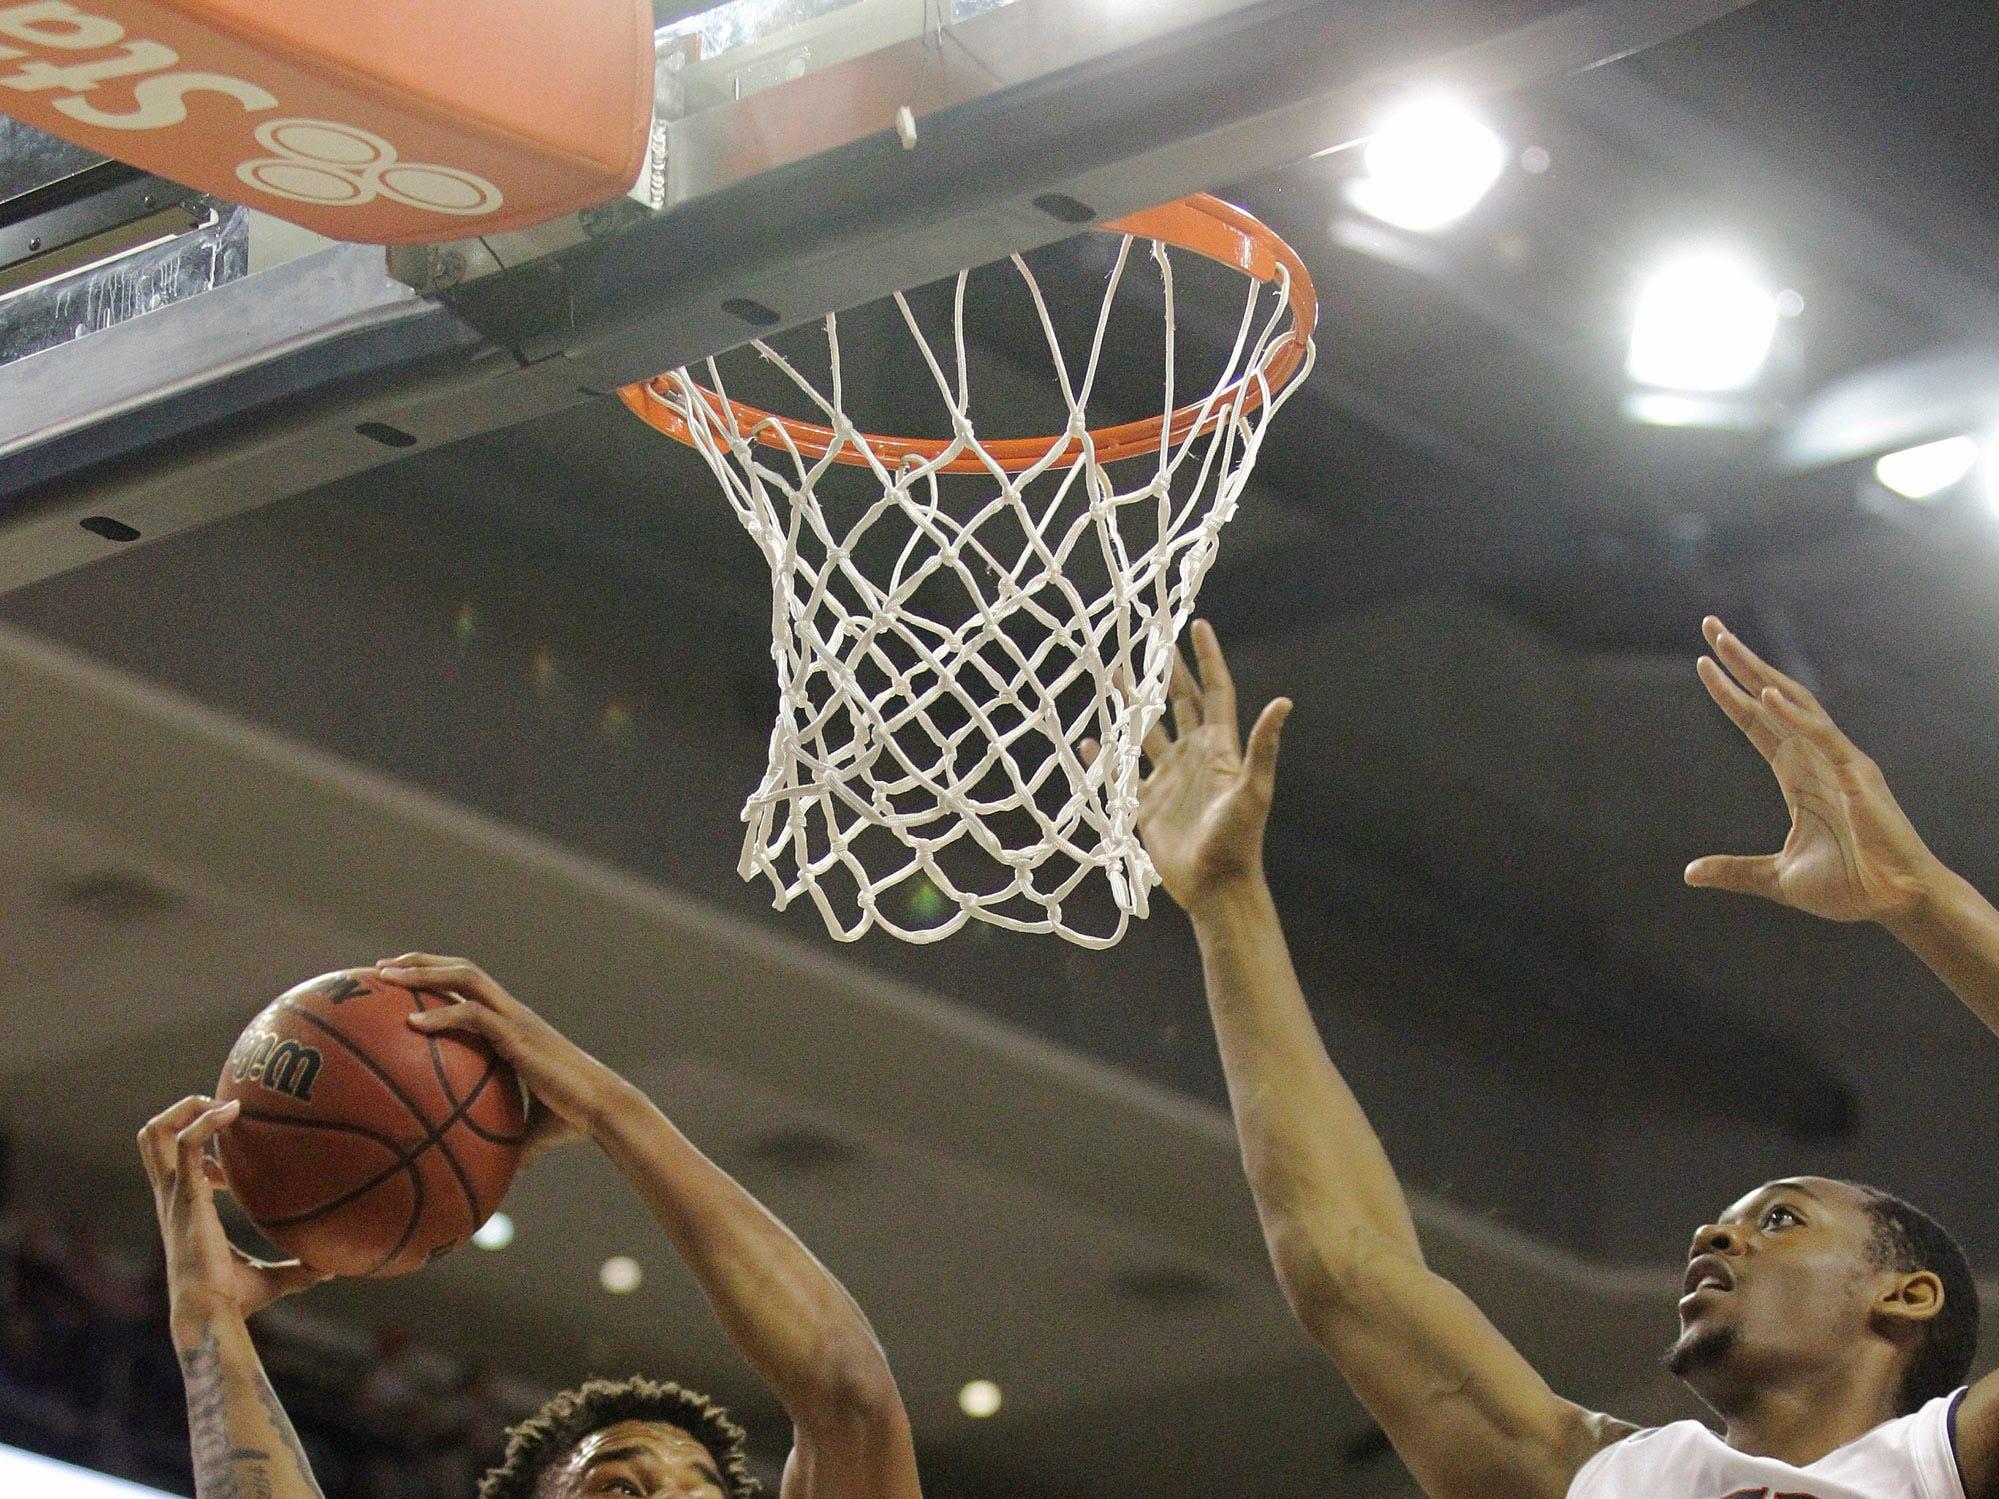 Dec 4, 2018; Auburn, AL, USA; Auburn Tigers forward Chuma Okeke (5) grabs a rebound from center Austin Wiley (50) during the first half against the UNC-Asheville Bulldogs at Auburn Arena. Mandatory Credit: John Reed-USA TODAY Sports